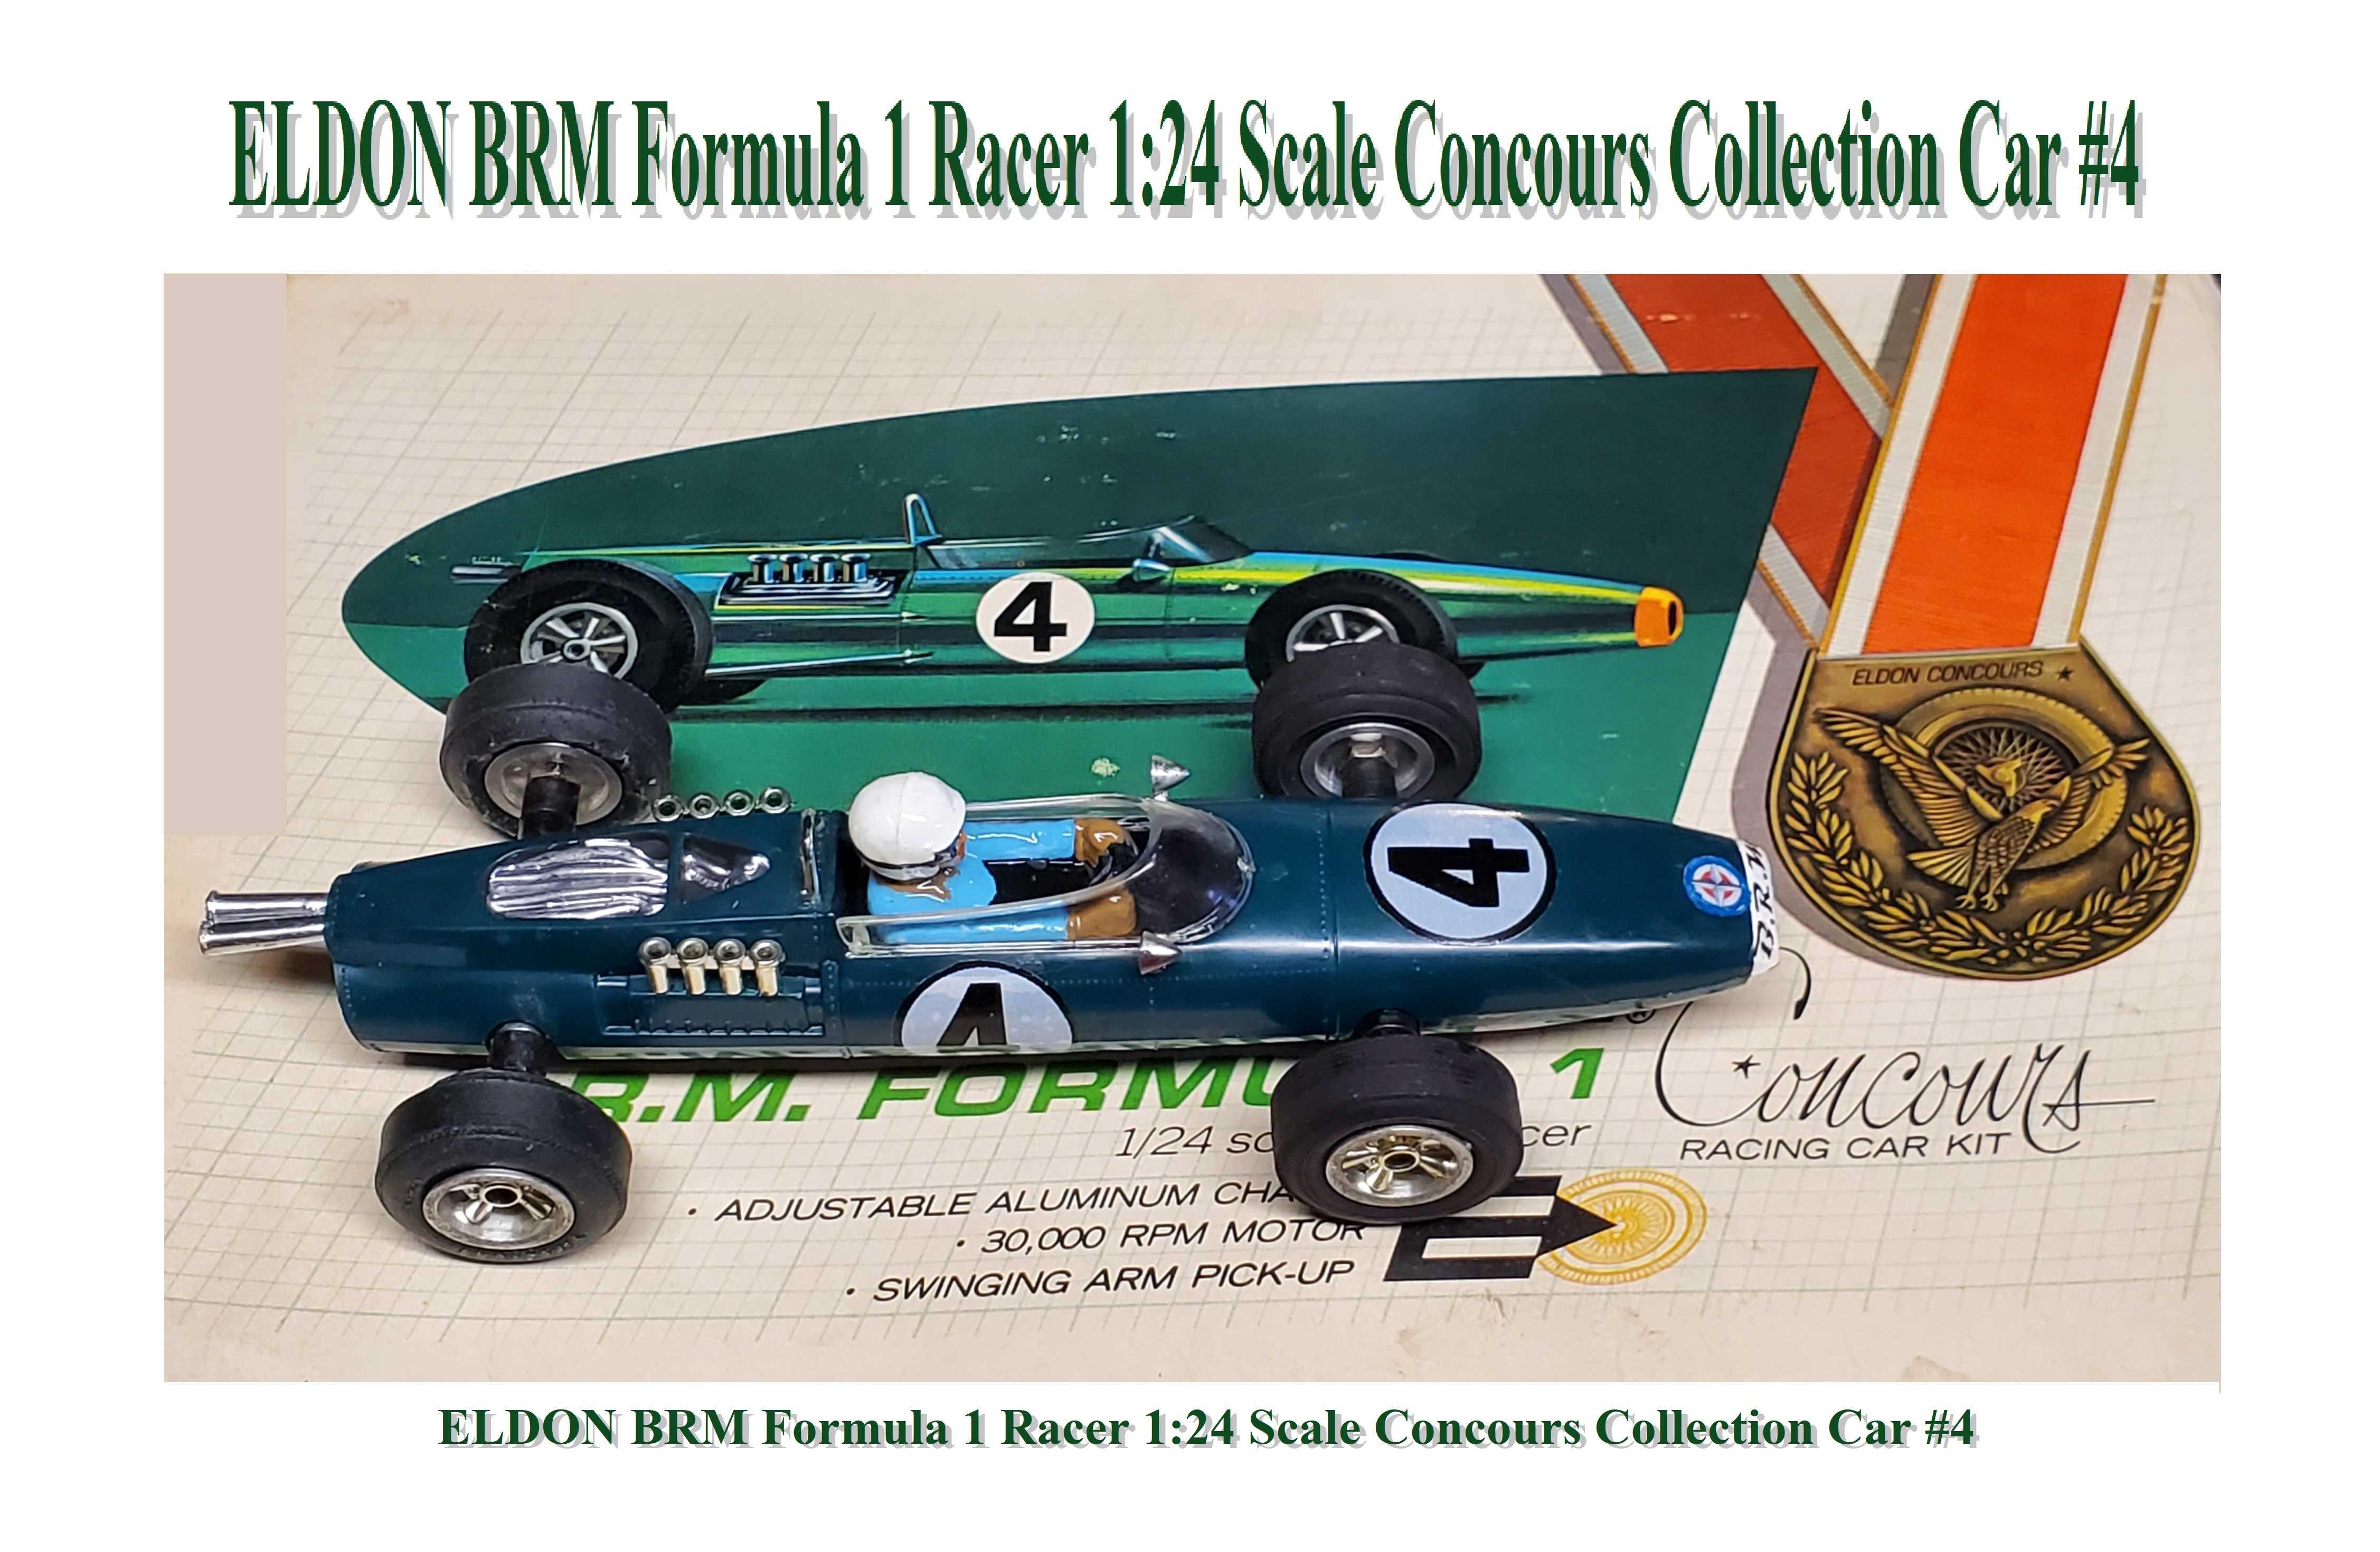 * Special Price * ELDON BRM Formula 1 Racer 1:24 Scale Concours Collection Car #4